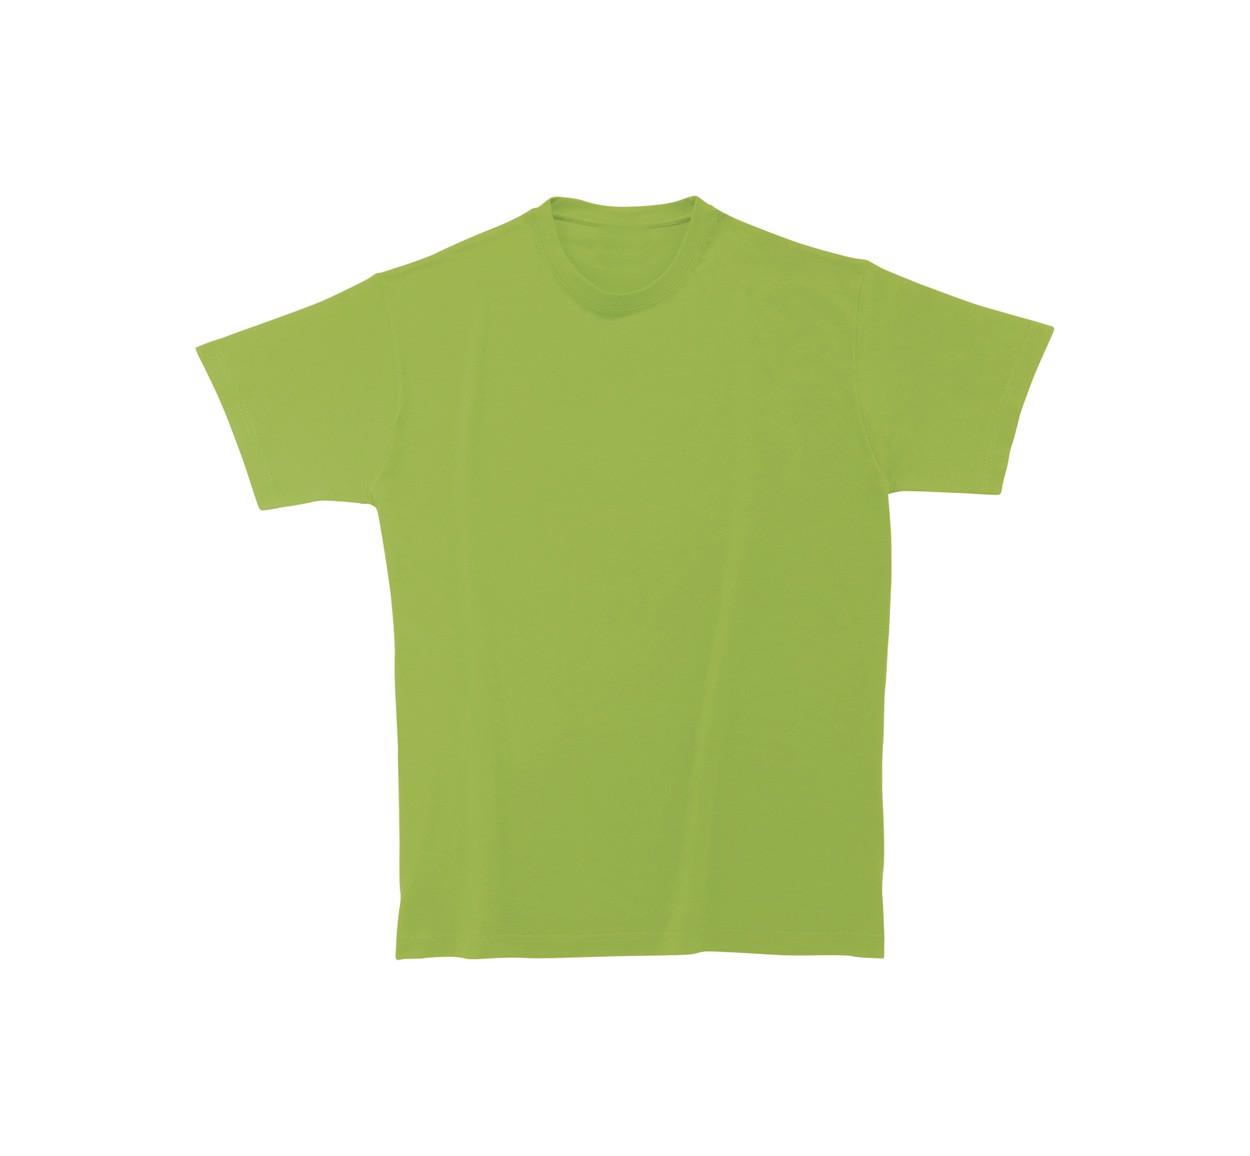 T-Shirt Heavy Cotton - Kiwi Green / M